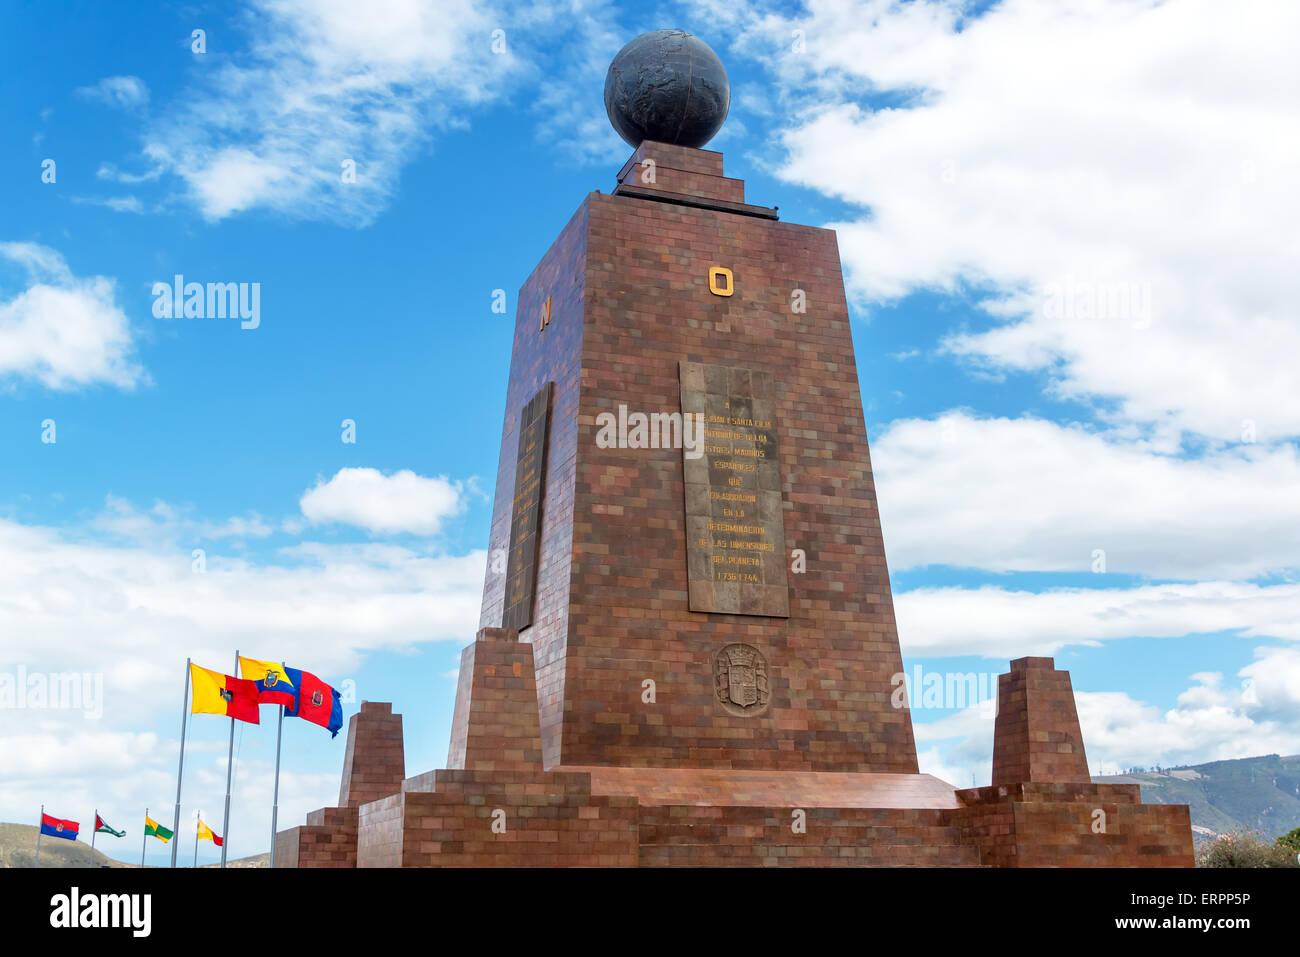 Monument to the Equator in Quito, Ecuador with the Ecuadorian flag in the bottom left - Stock Image